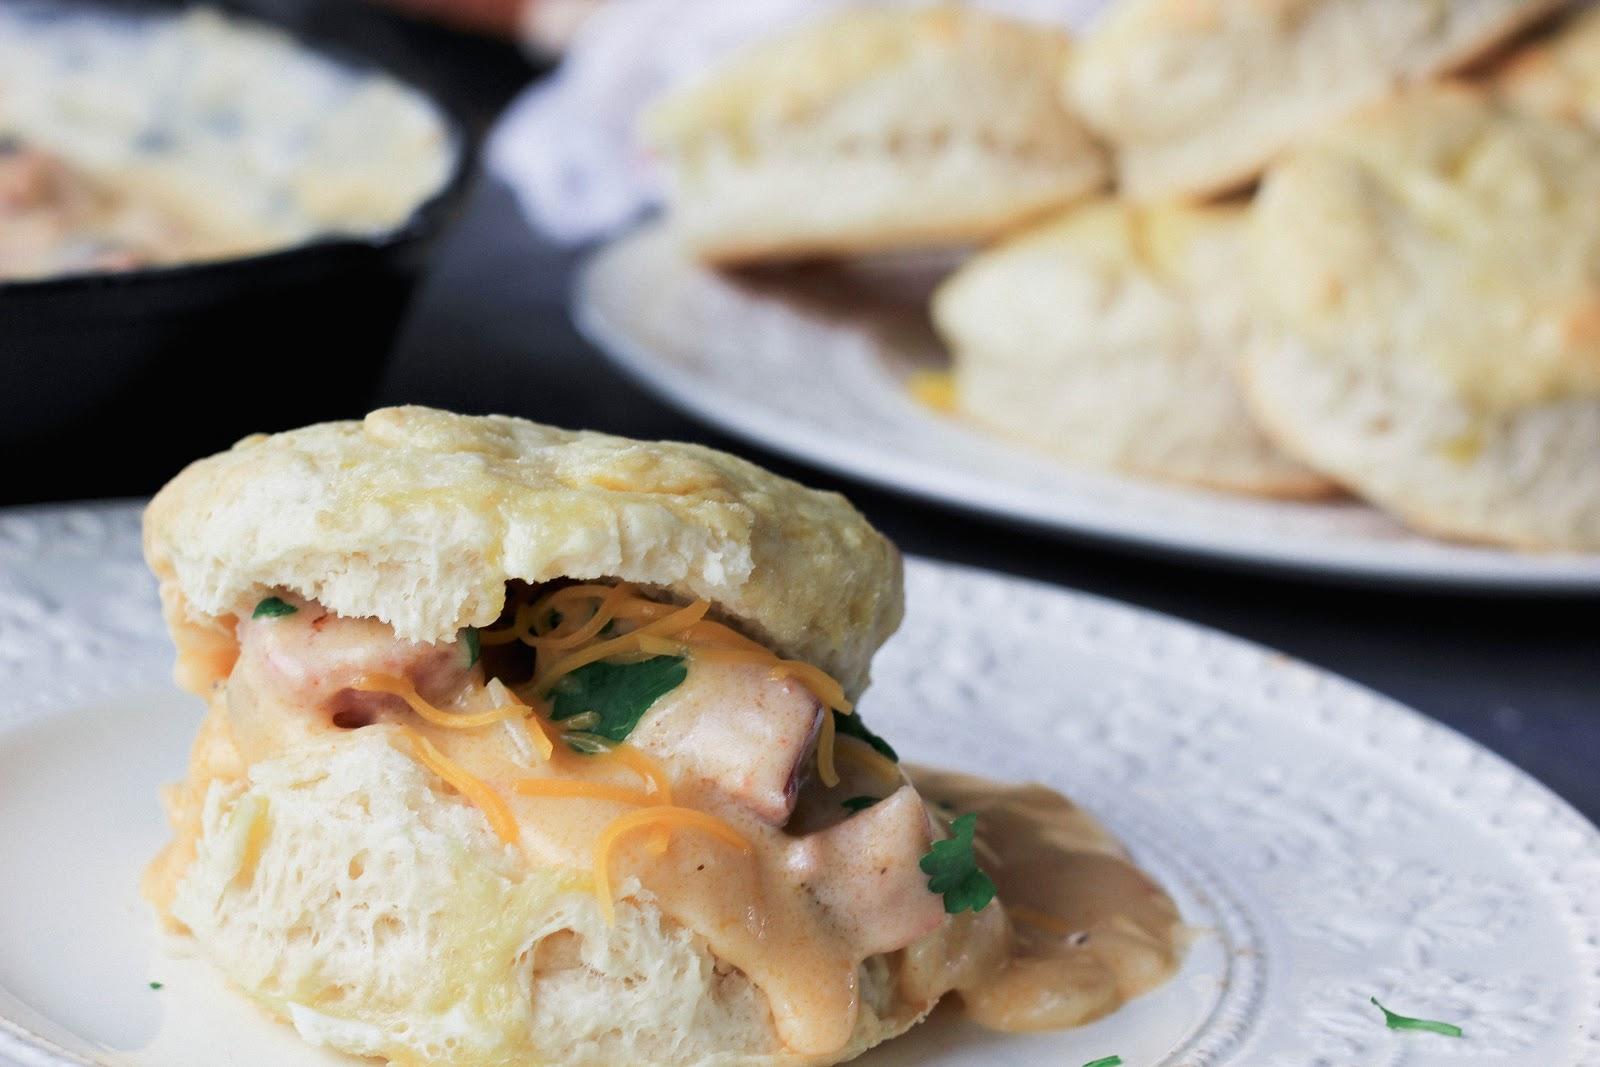 Southern Souffle: Buttermilk Biscuits & Cajun Sausage Gravy